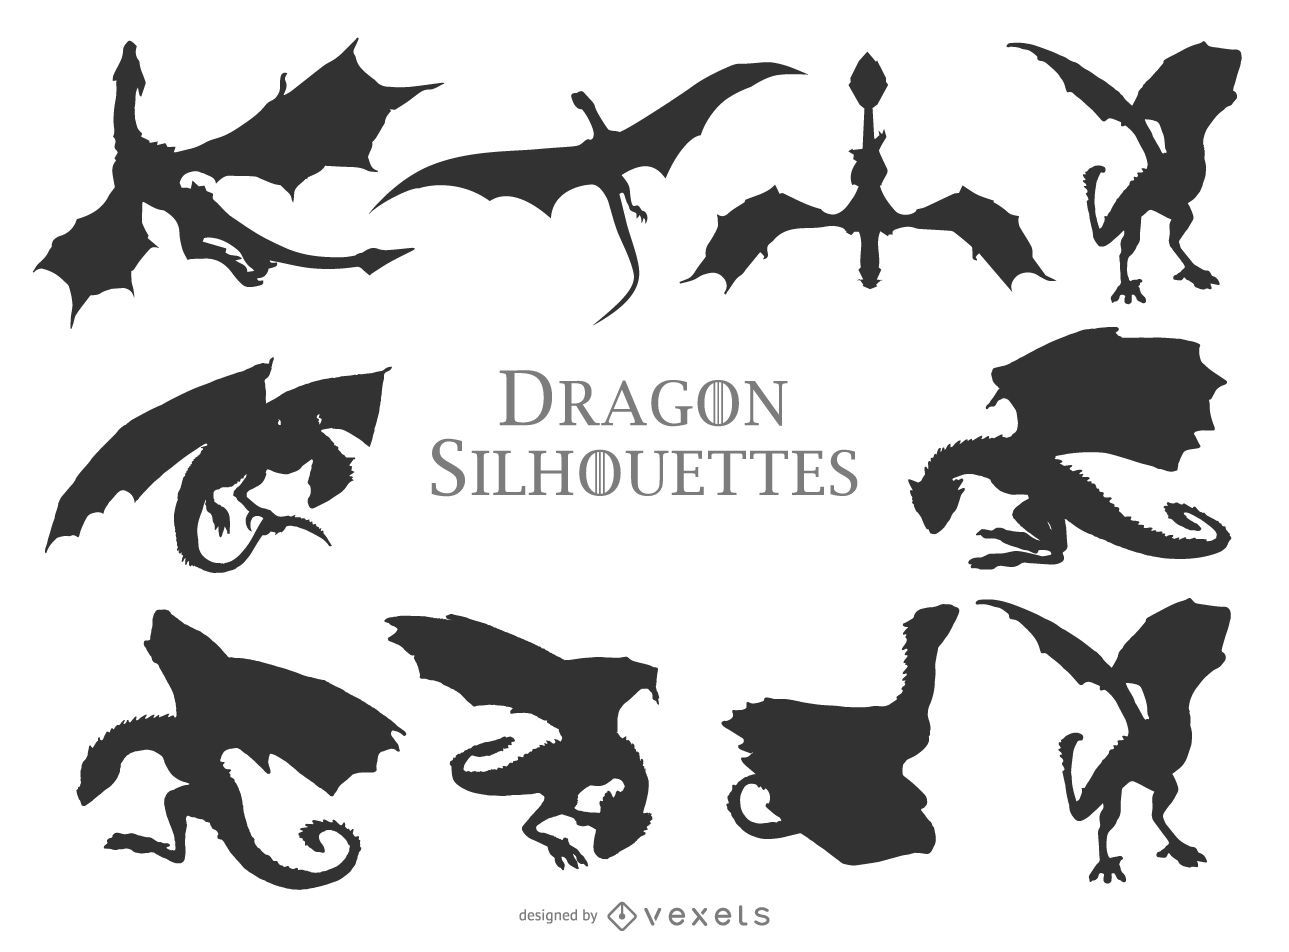 Drachensilhouetten-Sammlung